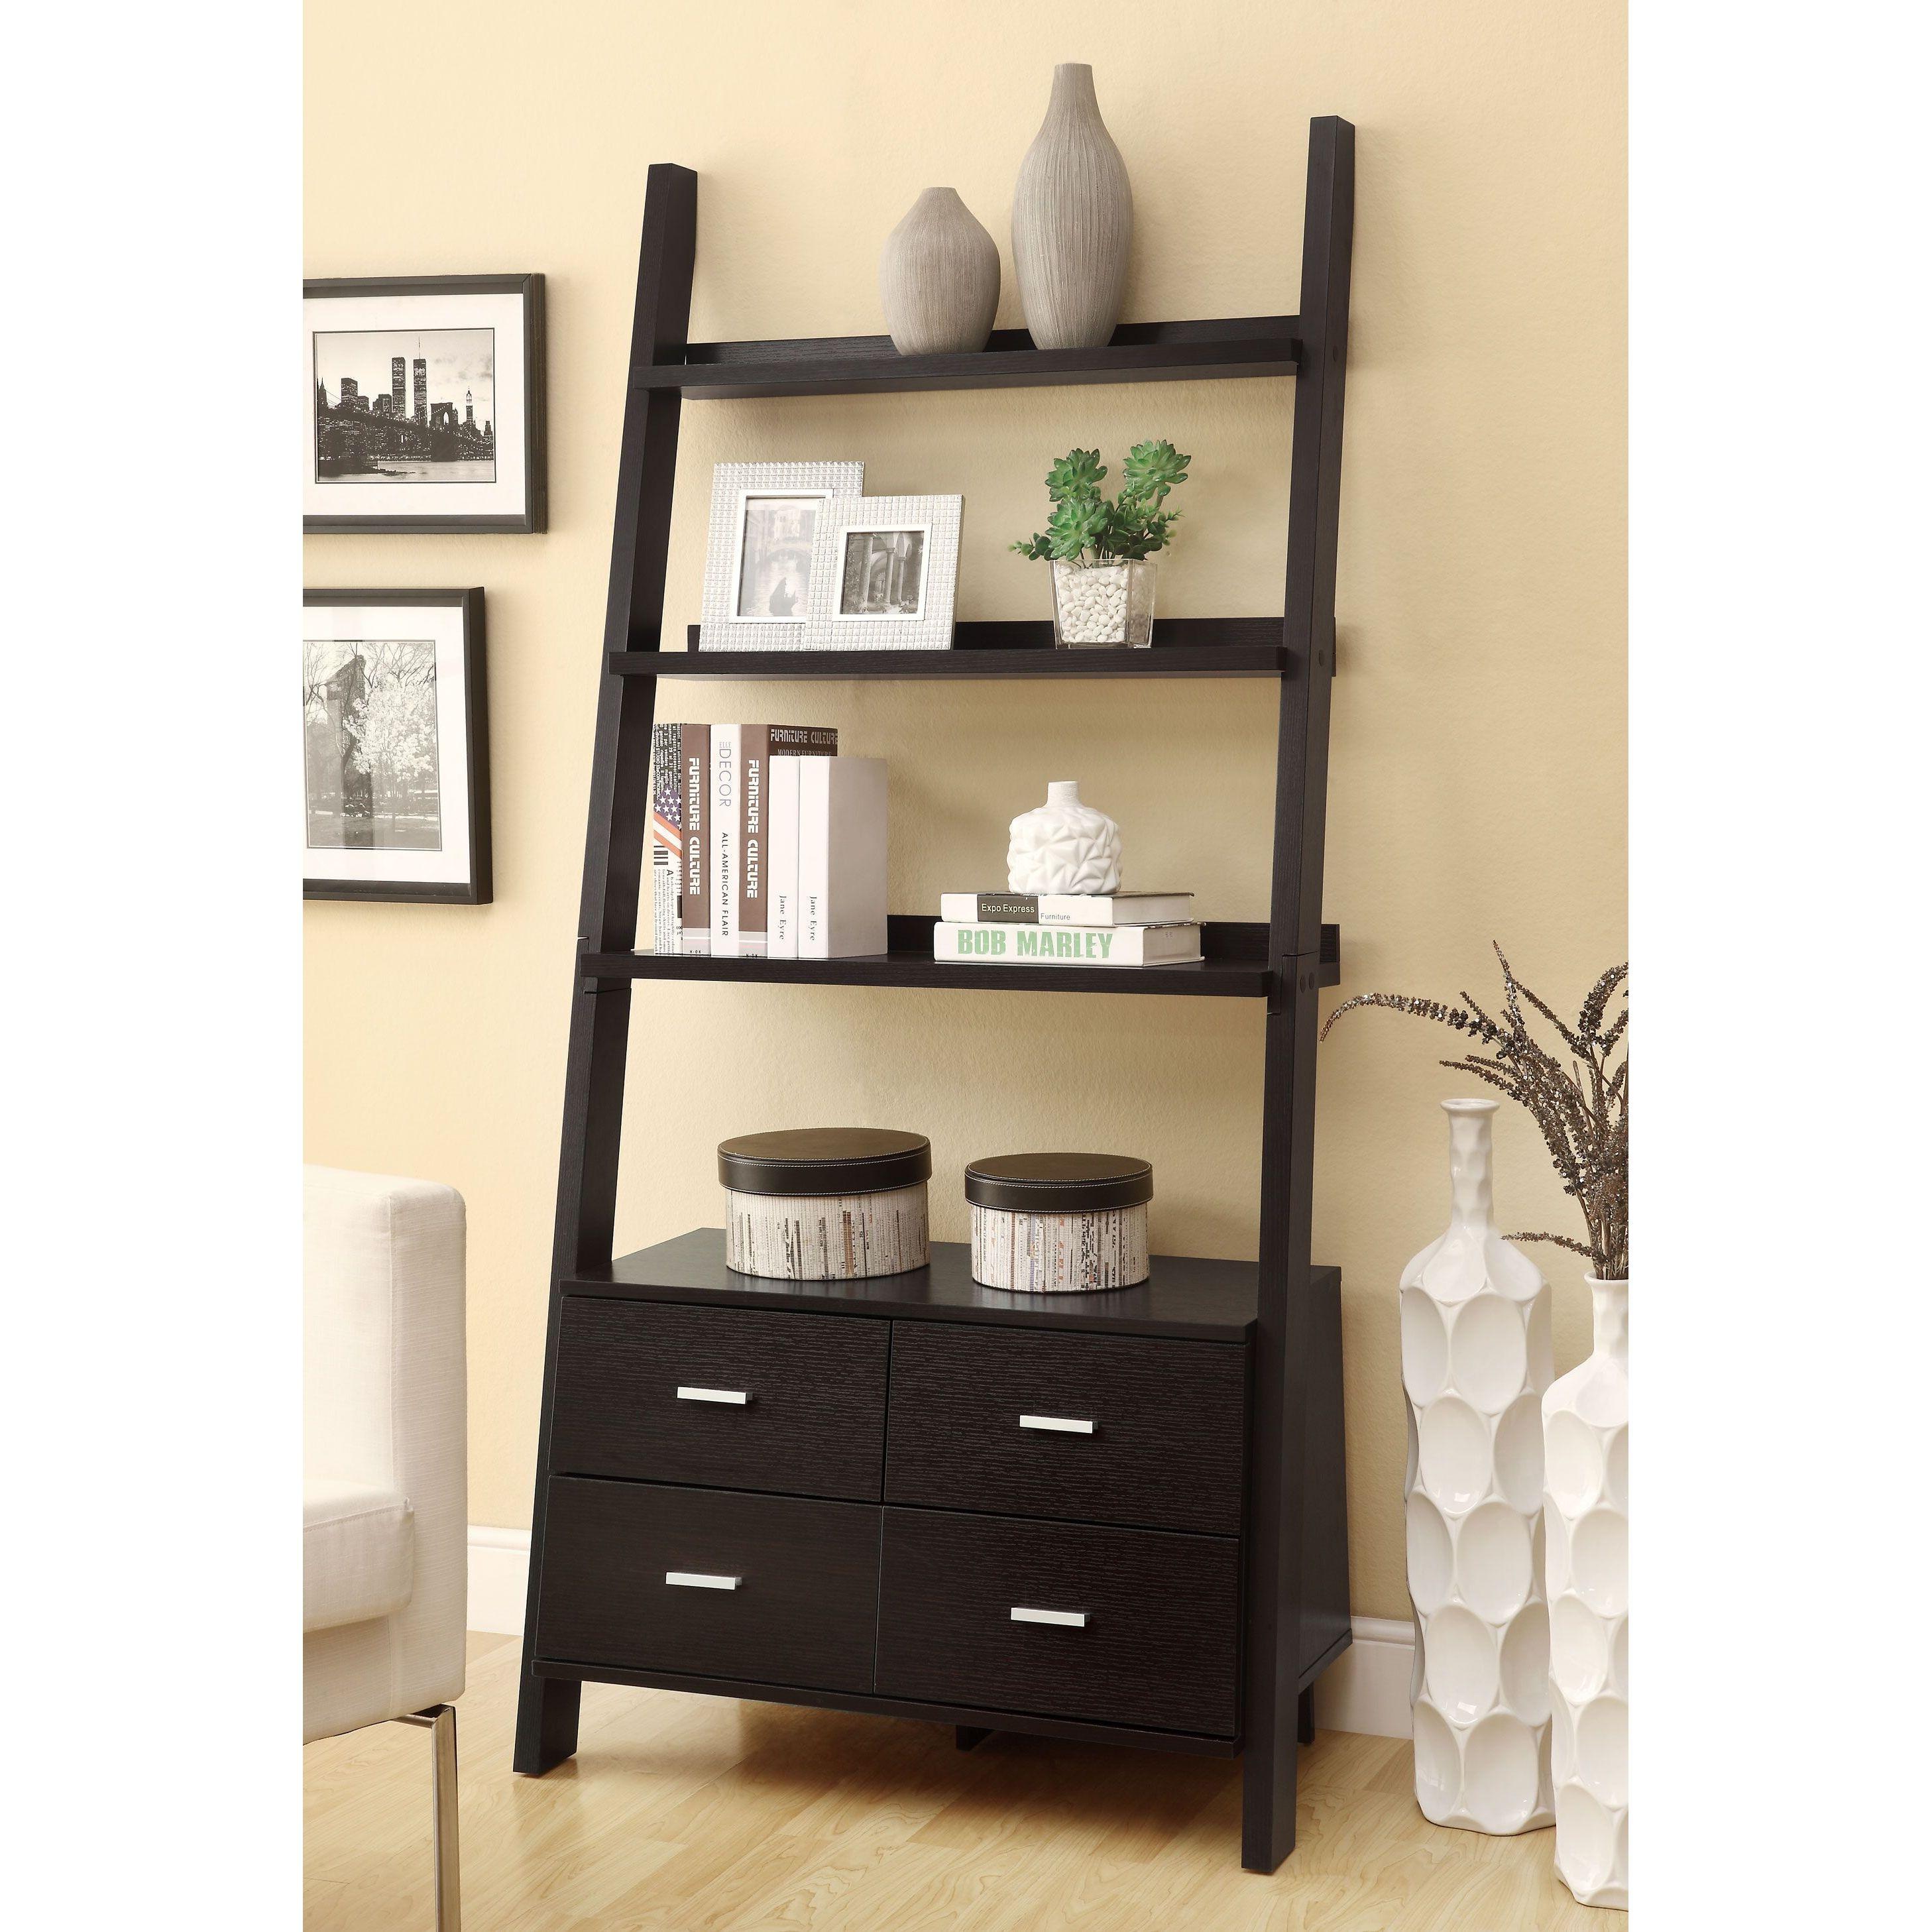 Coaster Company Cappuccino 4 Shelf 4 Drawer Ladder Bookcase 33 50 X 16 75 X 72